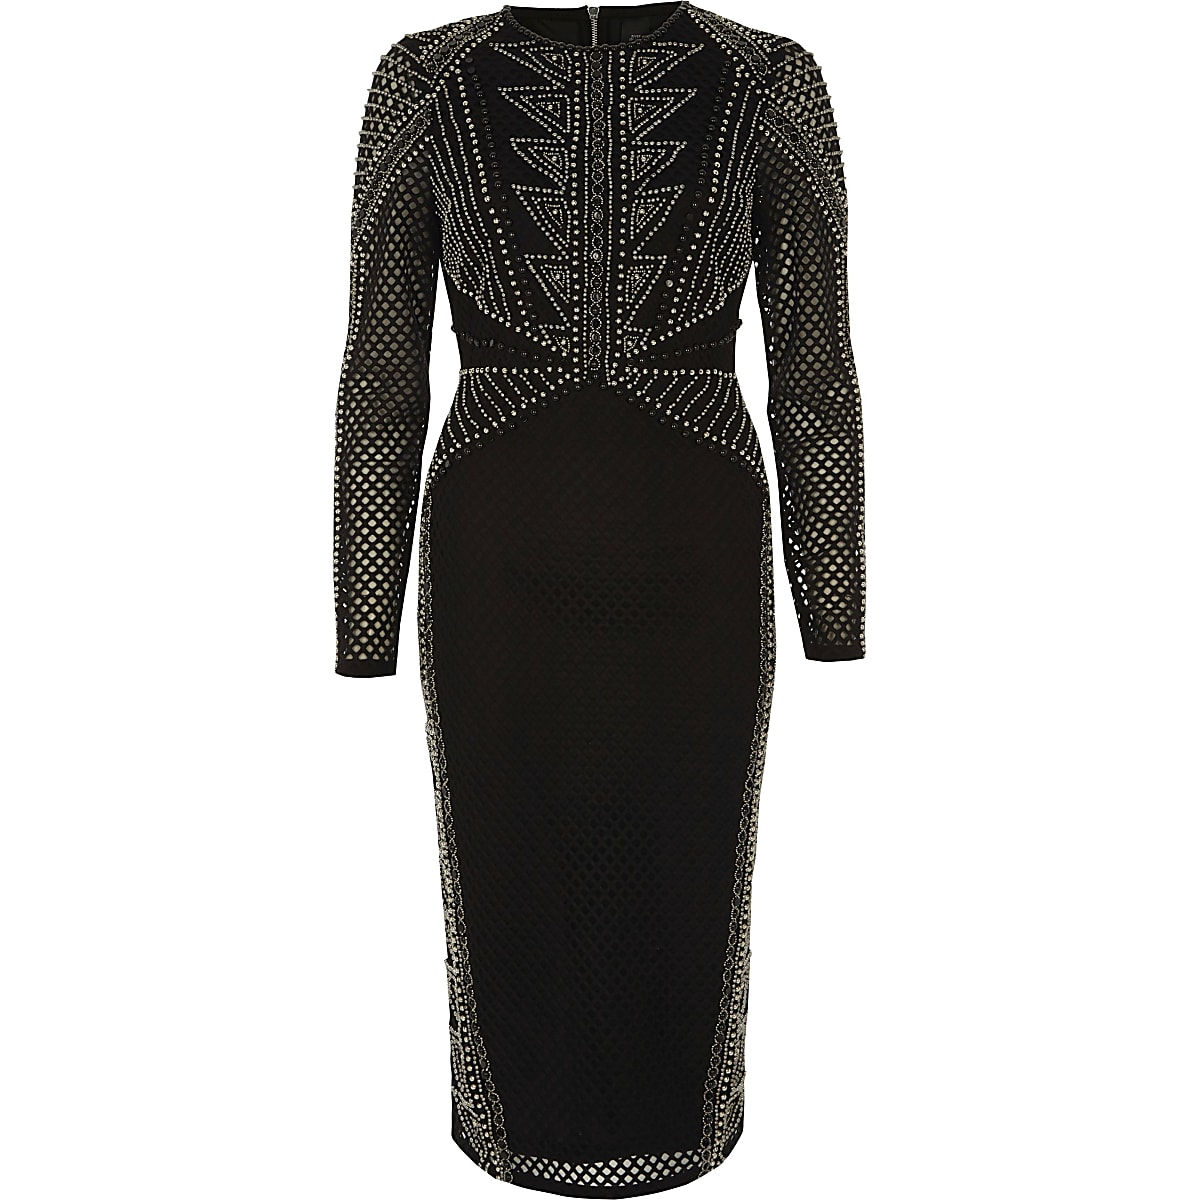 Black embellished mesh bodycon midi dress